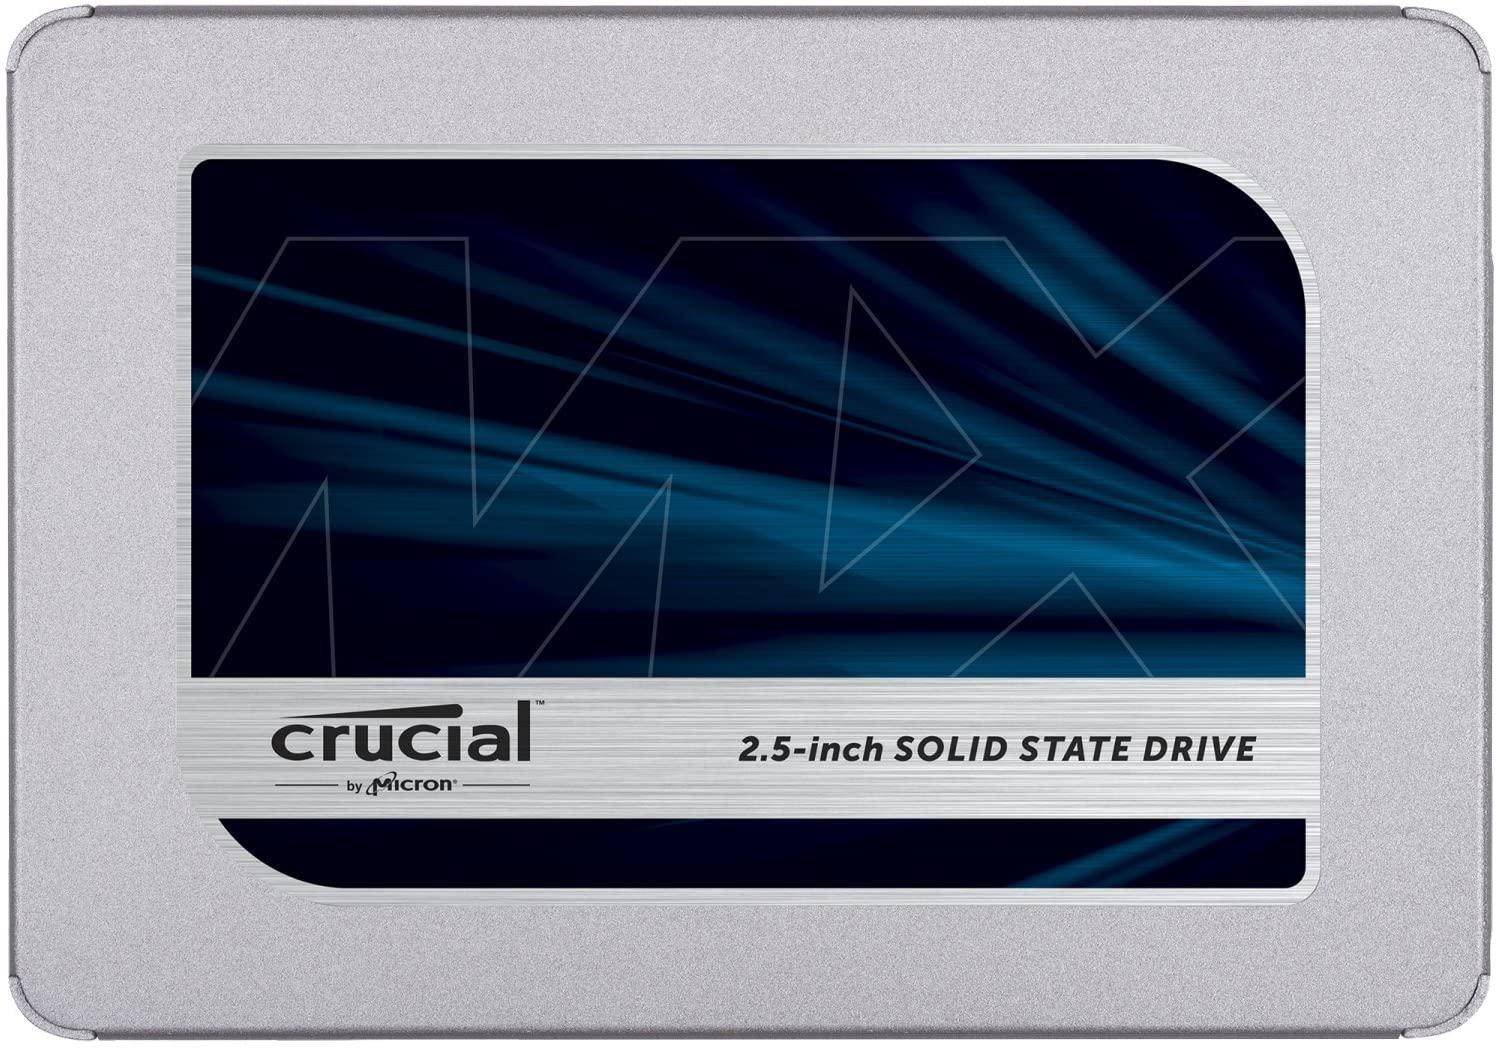 Crucial SSD 1TB amazon